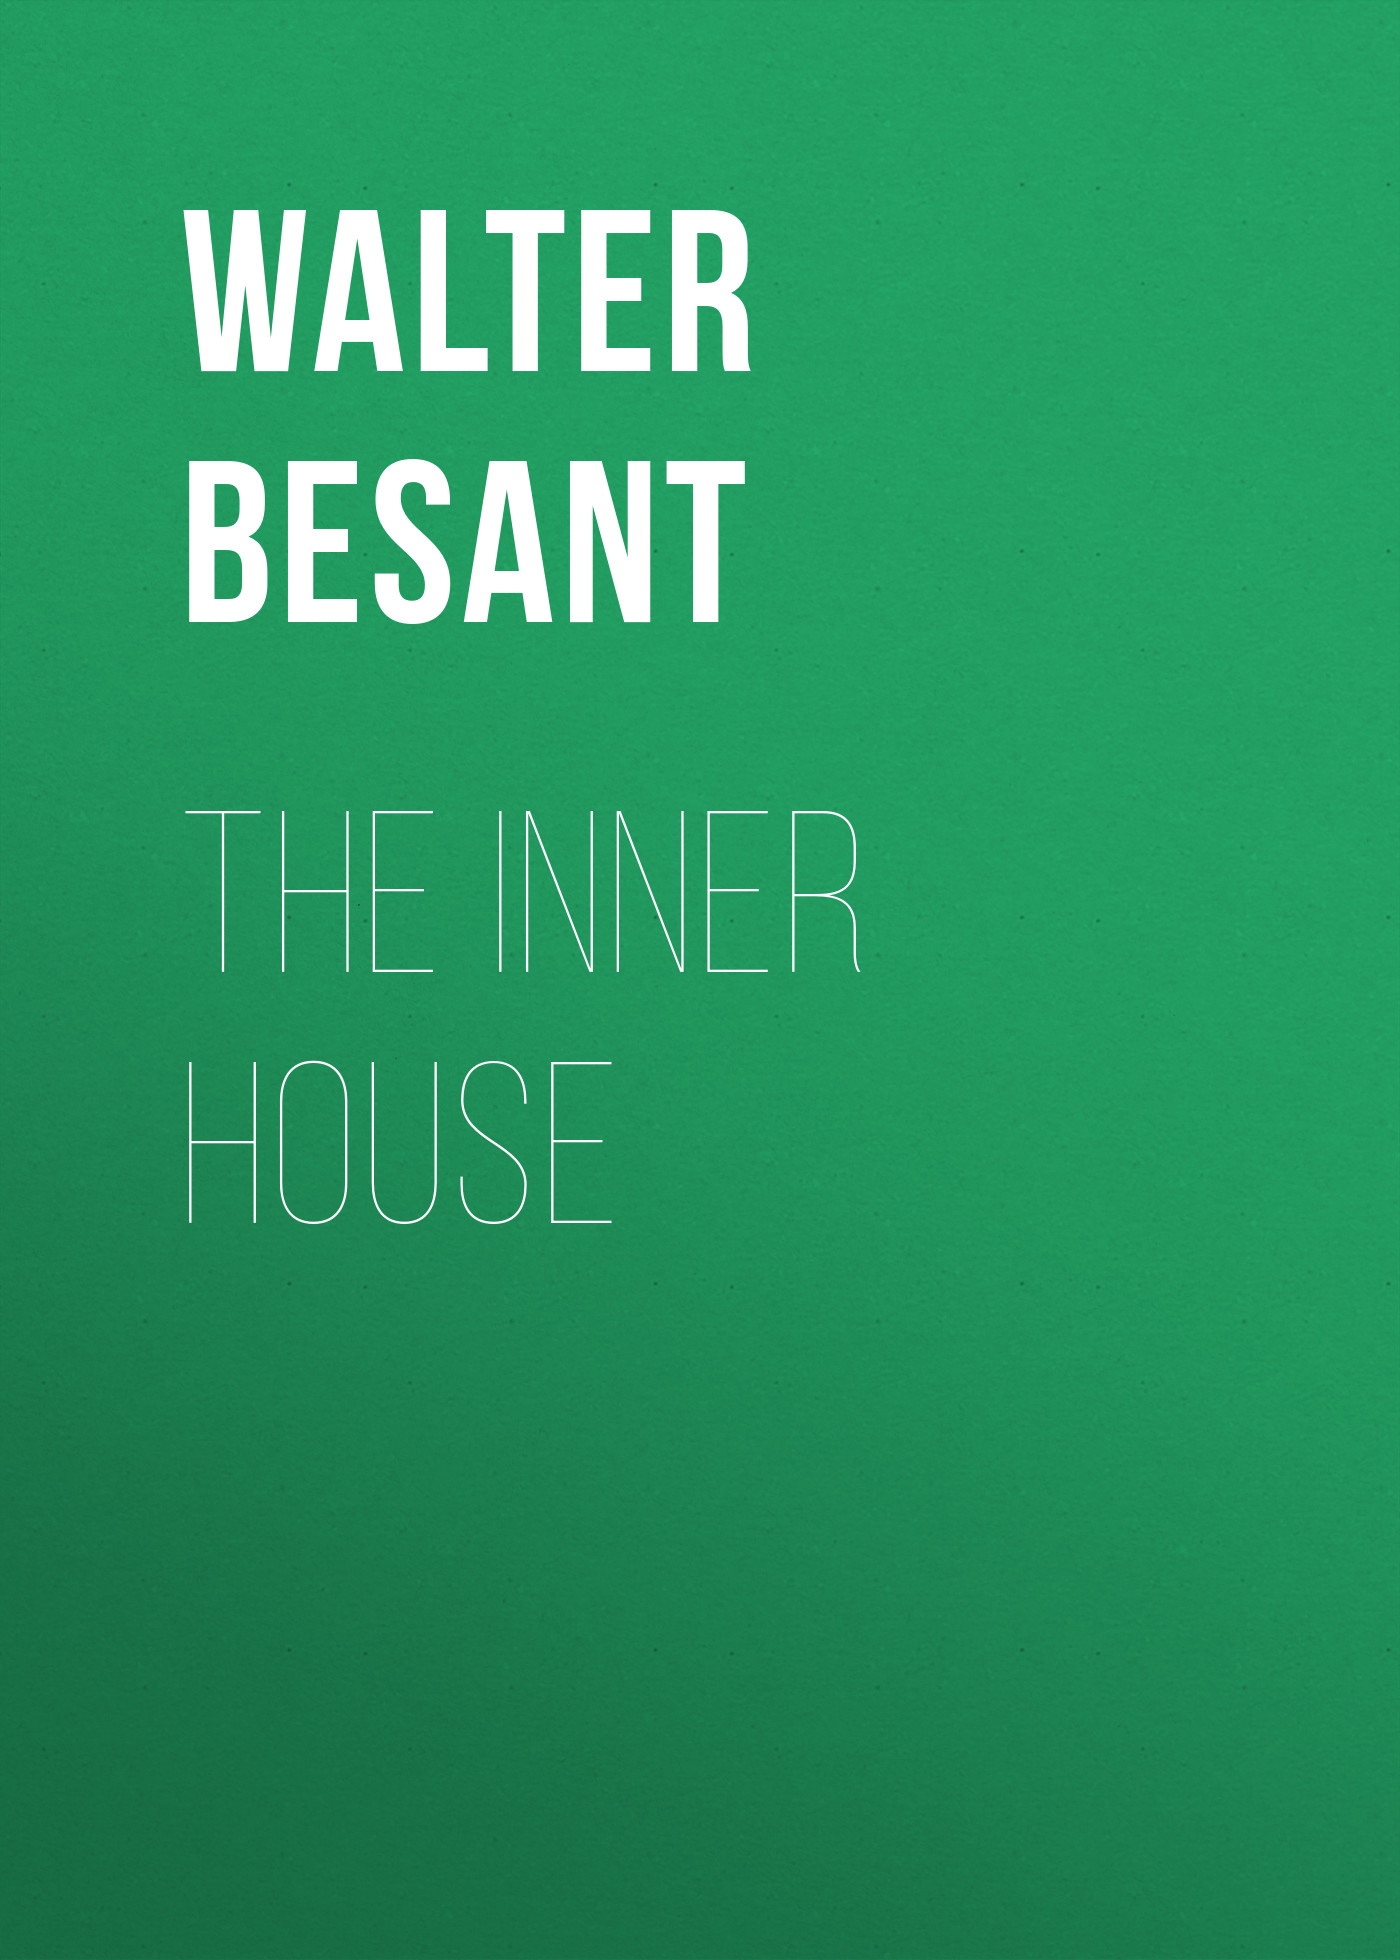 Walter Besant The inner house walter besant london